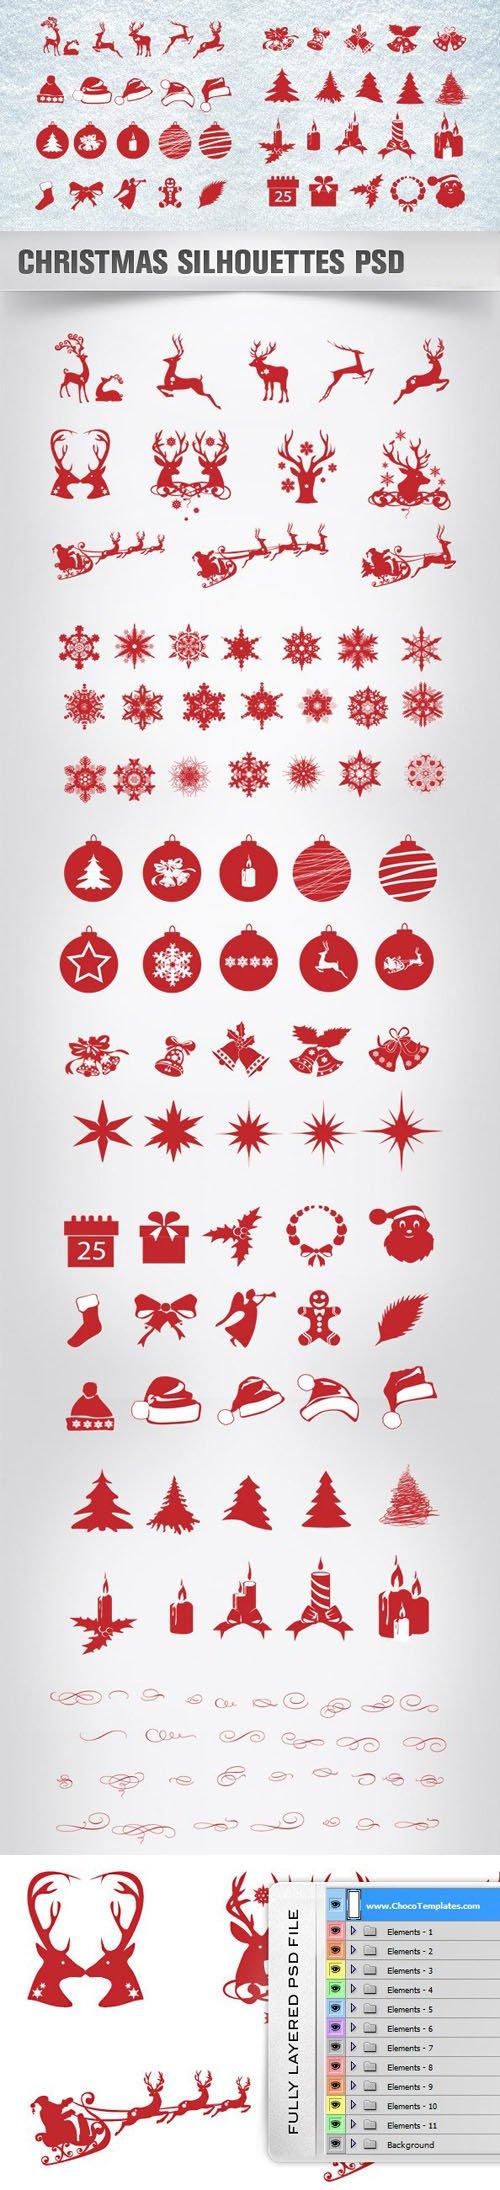 108 Christmas Silhouettes PSD Templates